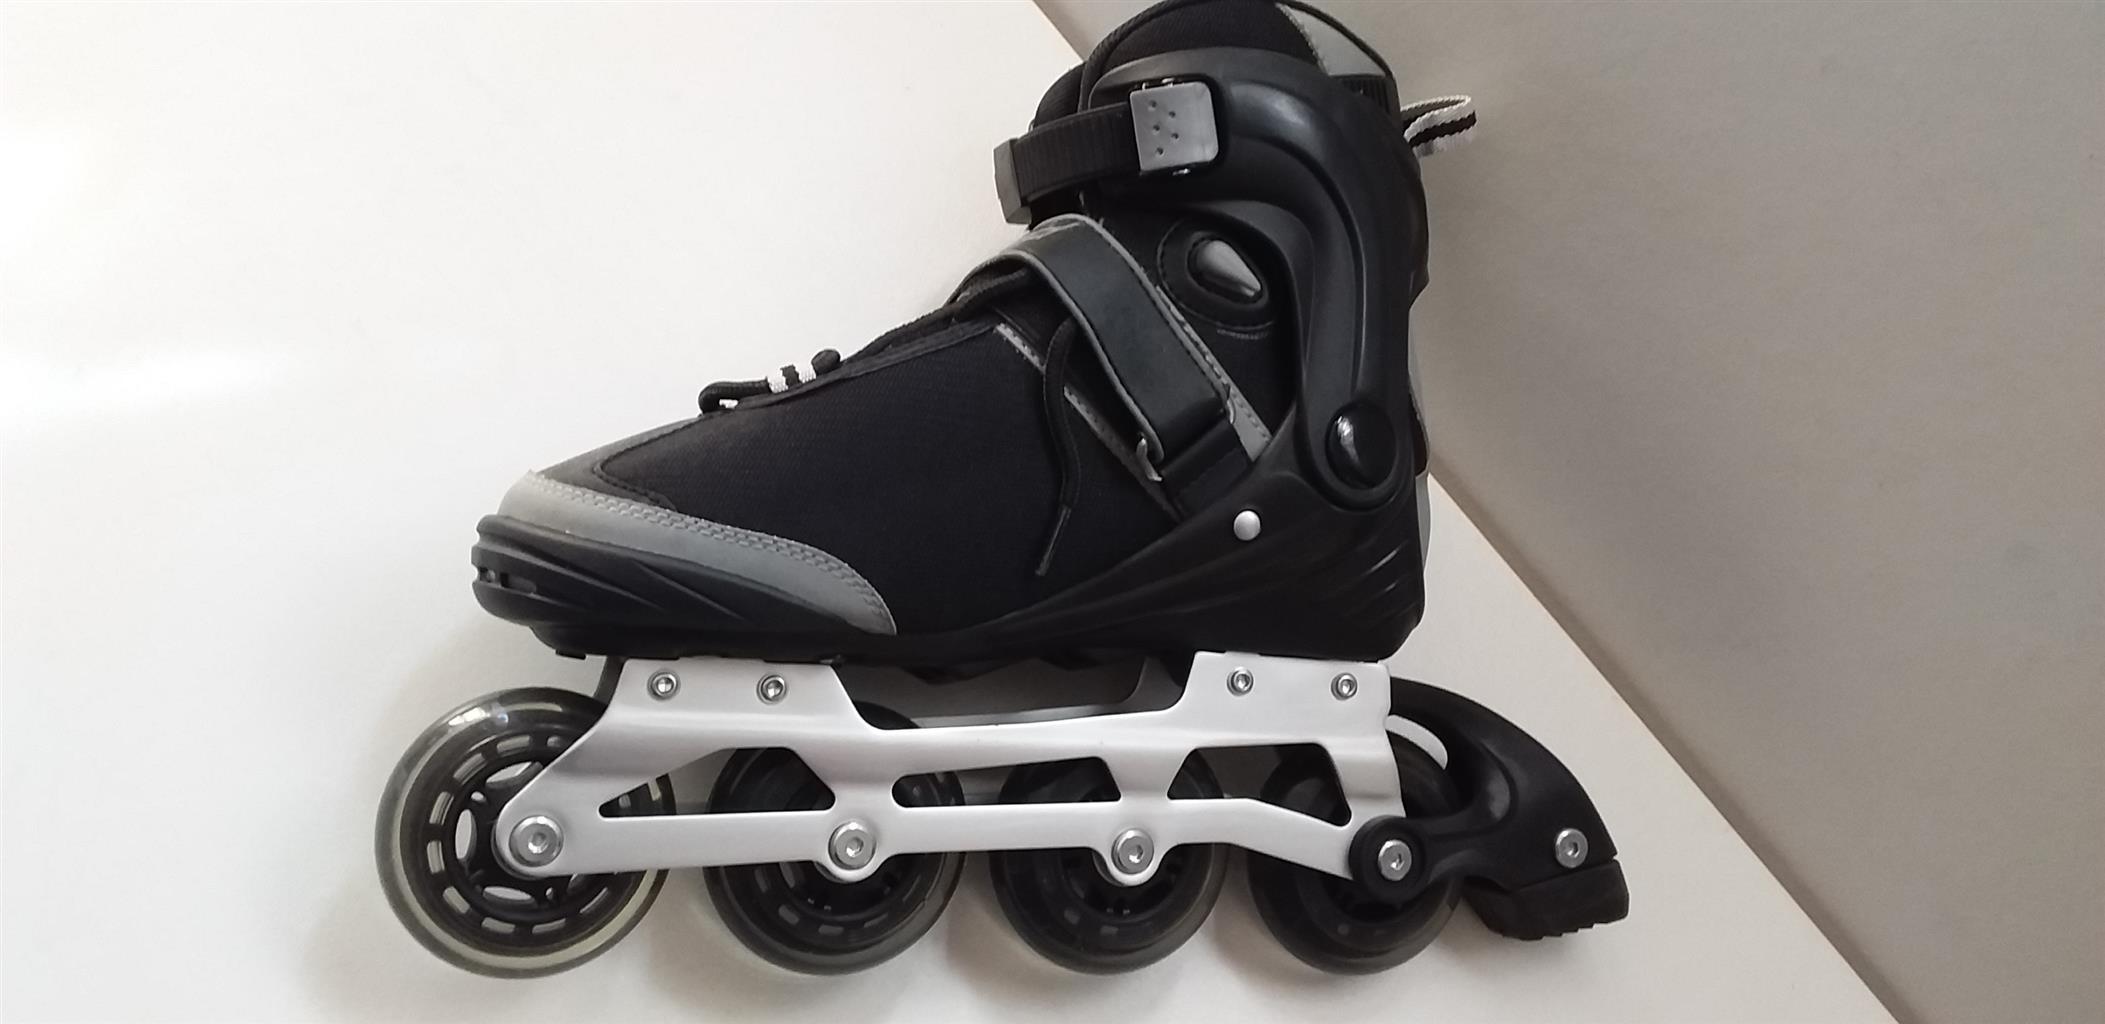 Maxed In Line Skates